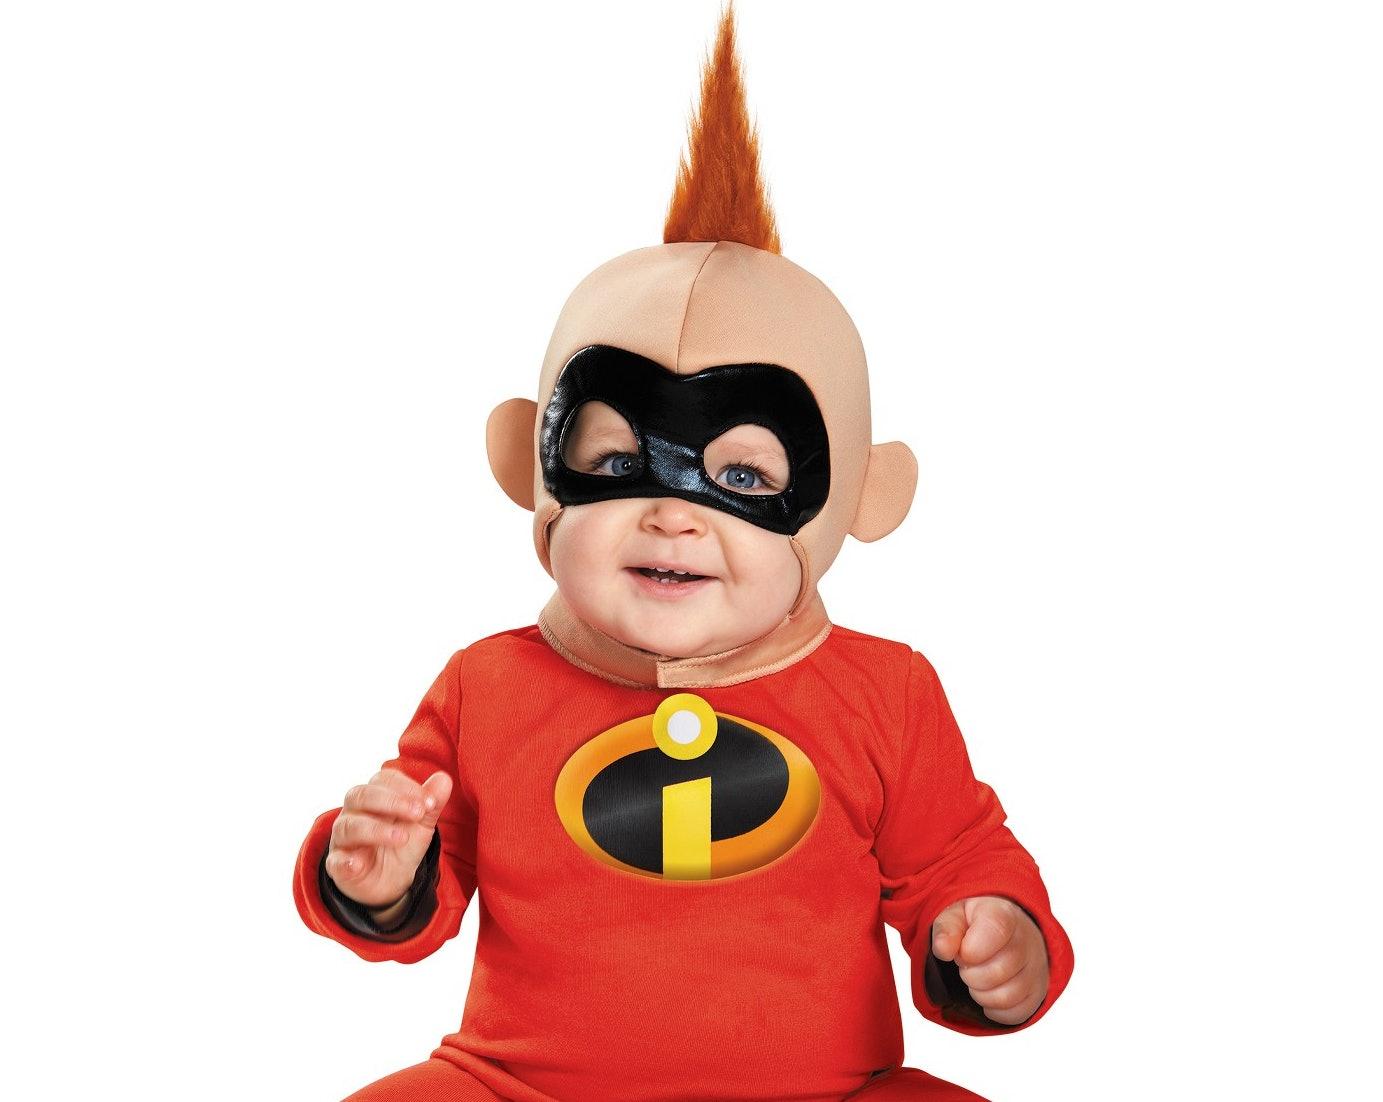 sc 1 st  Romper & Targetu0027s Disney Baby Halloween Costumes Are So Cute u0026 So Affordable